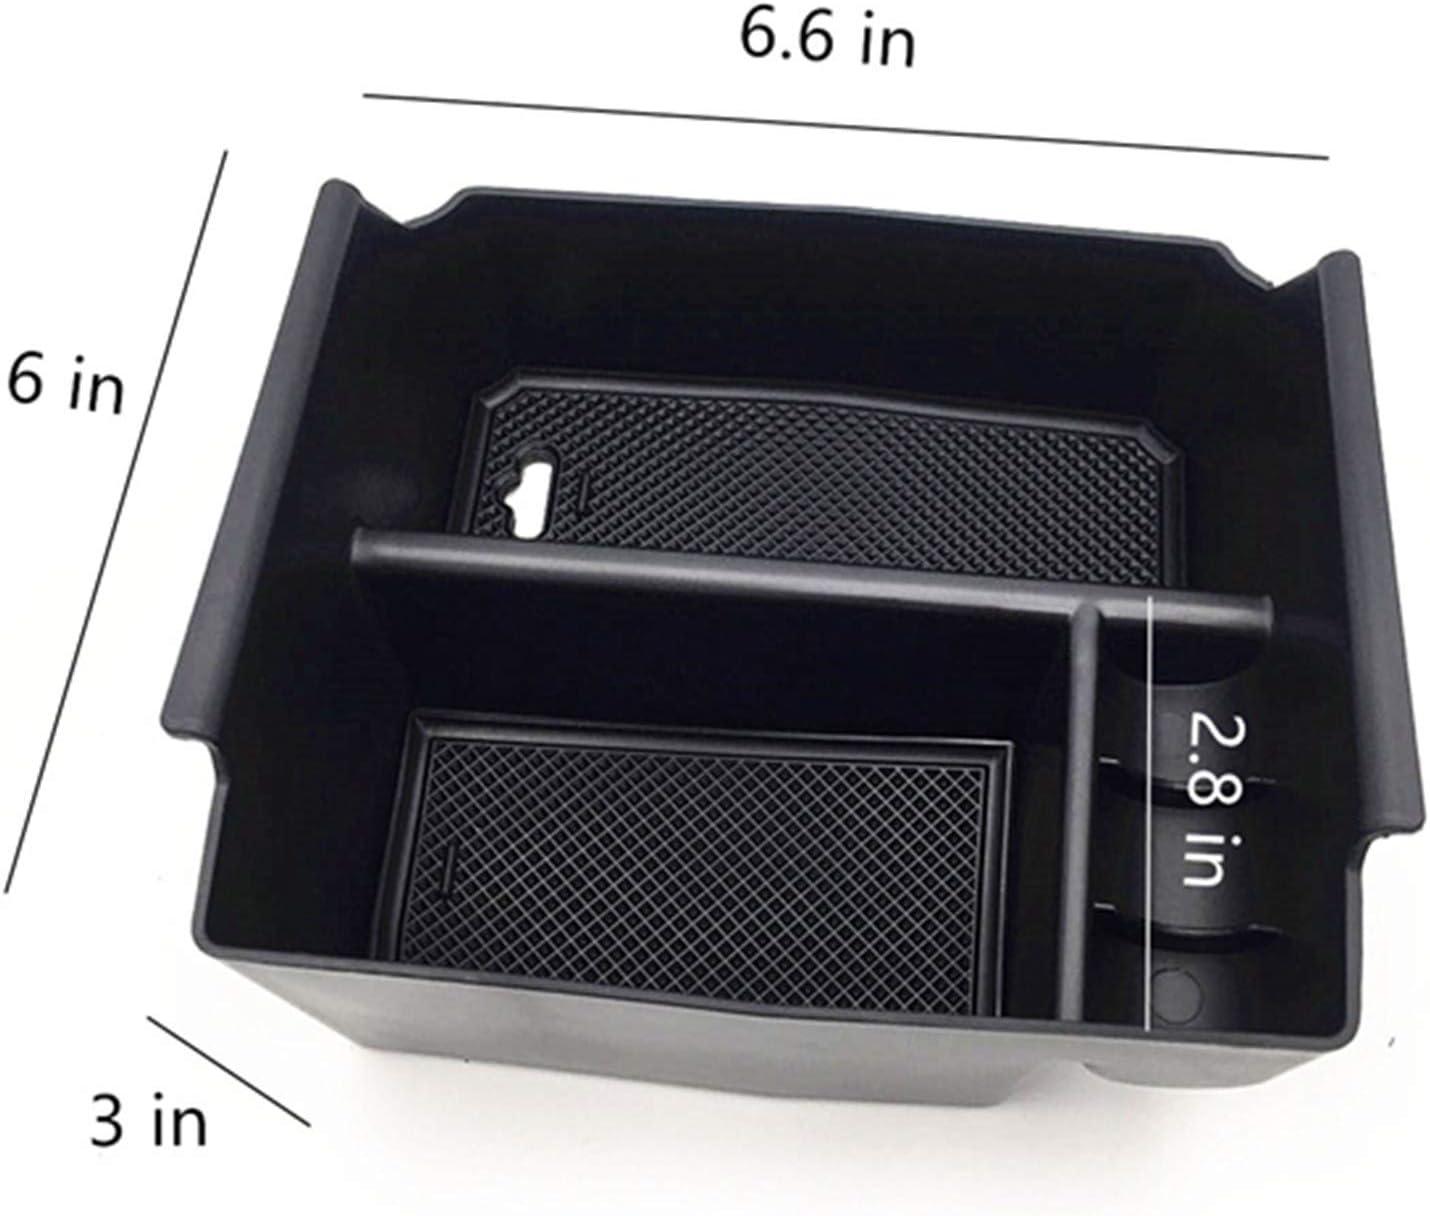 EVTIME for Jeep Wrangler JK and JKU Accessories 2011-2018 Center Console Organizer Tray